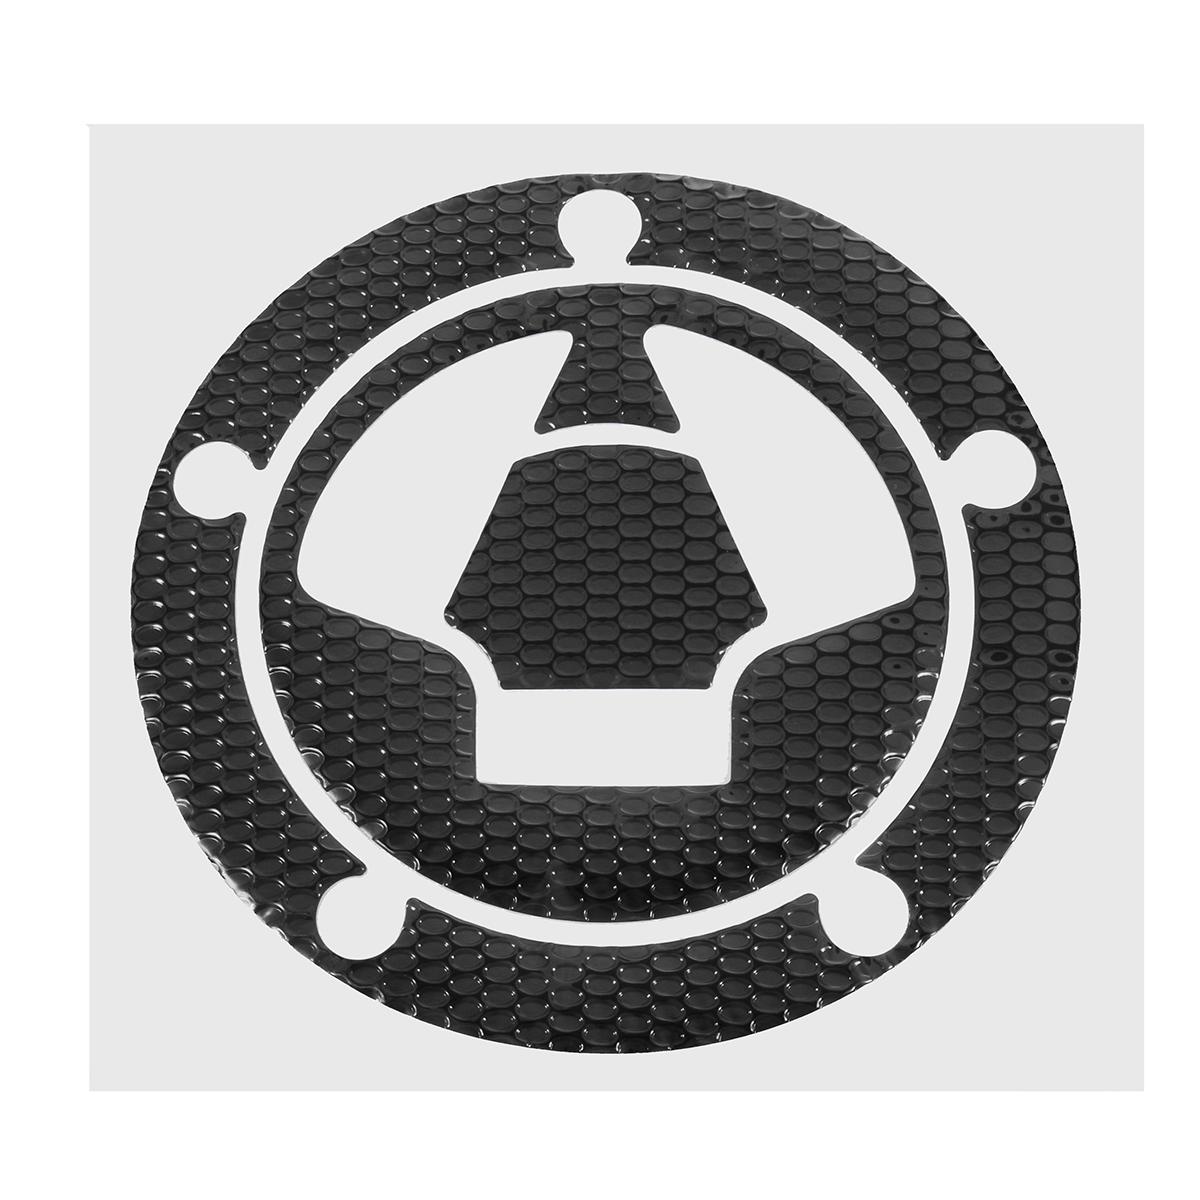 Motorcycle 3d Fuel Tank Cap Cover Pad Sticker For Kawasaki Ninja